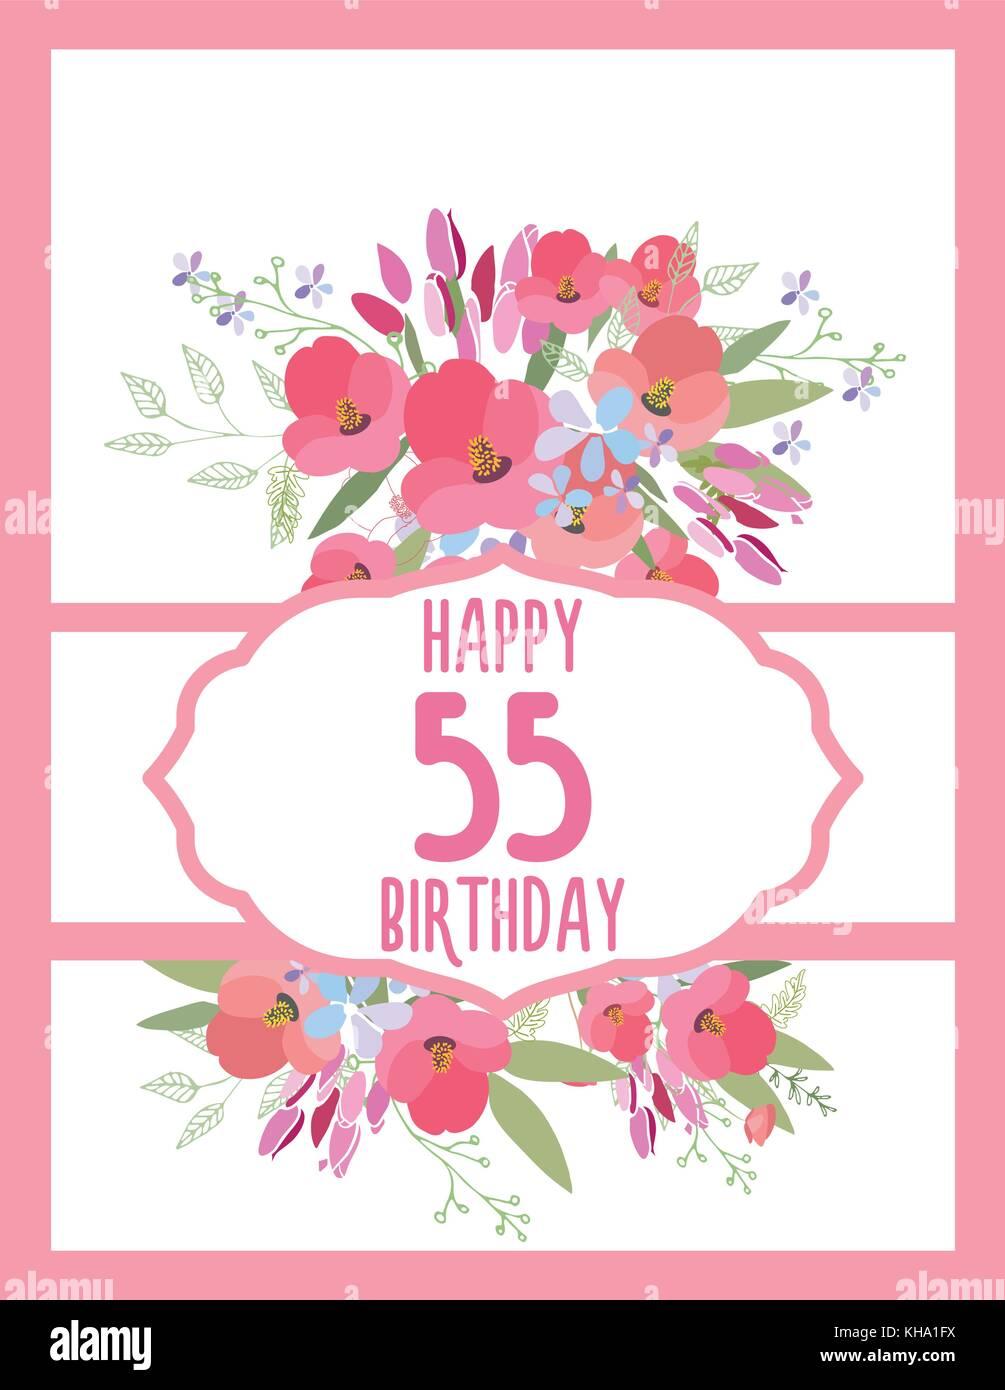 Greeting Card For Anniversary Birthday Stock Vector Art